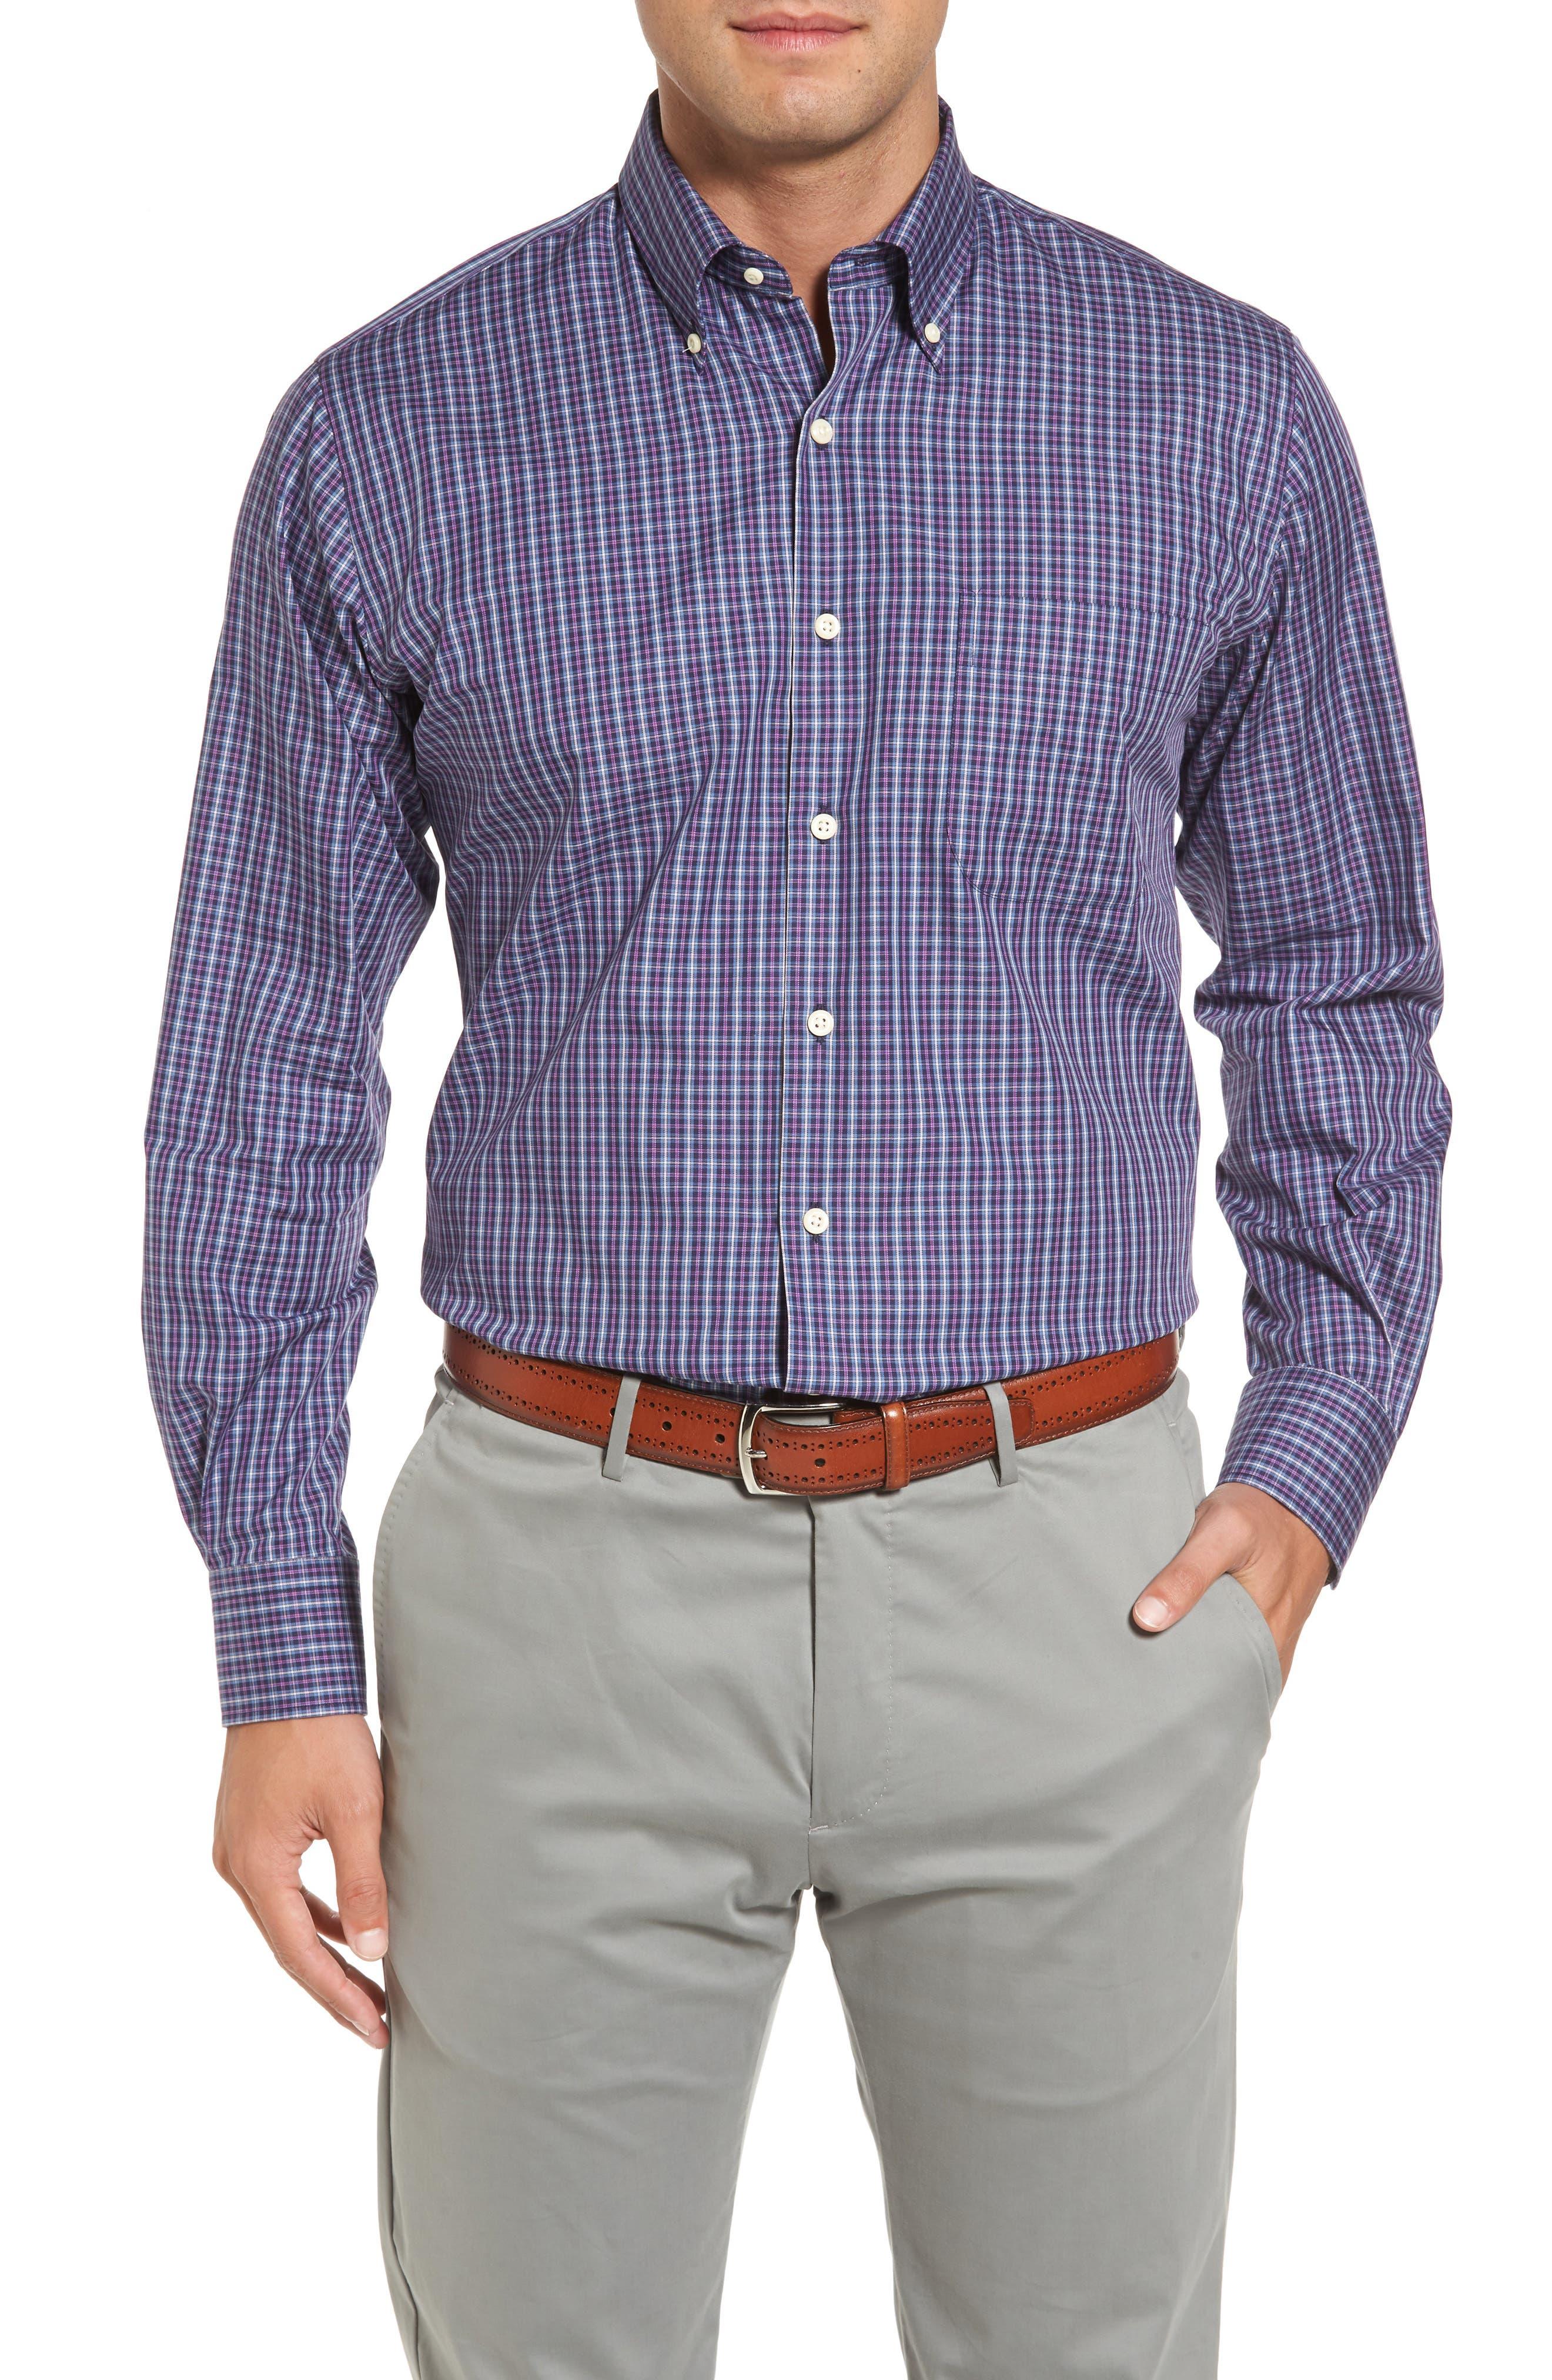 Main Image - Peter Millar Hillock Regular Fit Plaid Sport Shirt